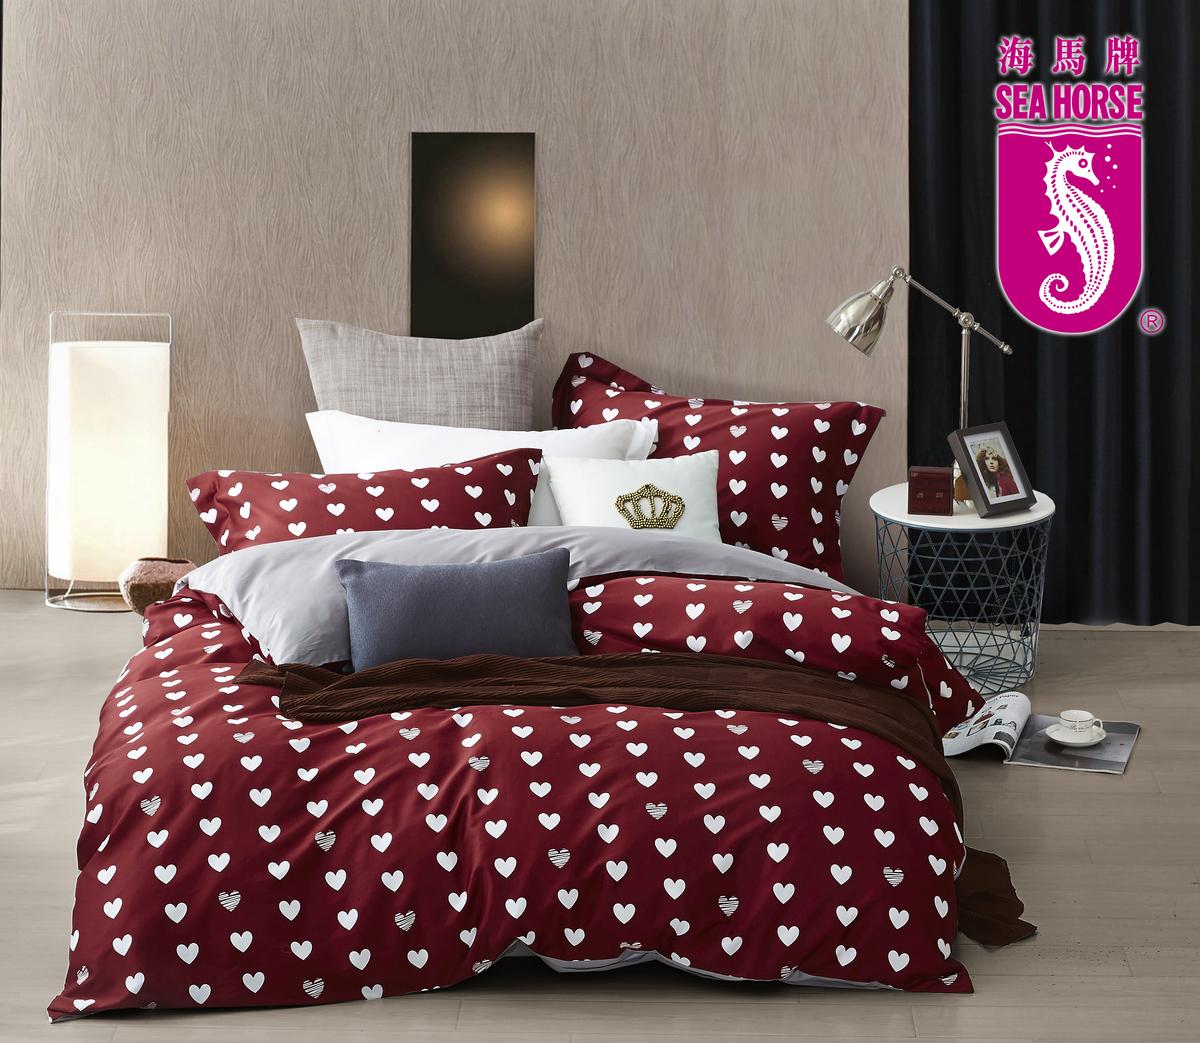 Bedding Set (Single)